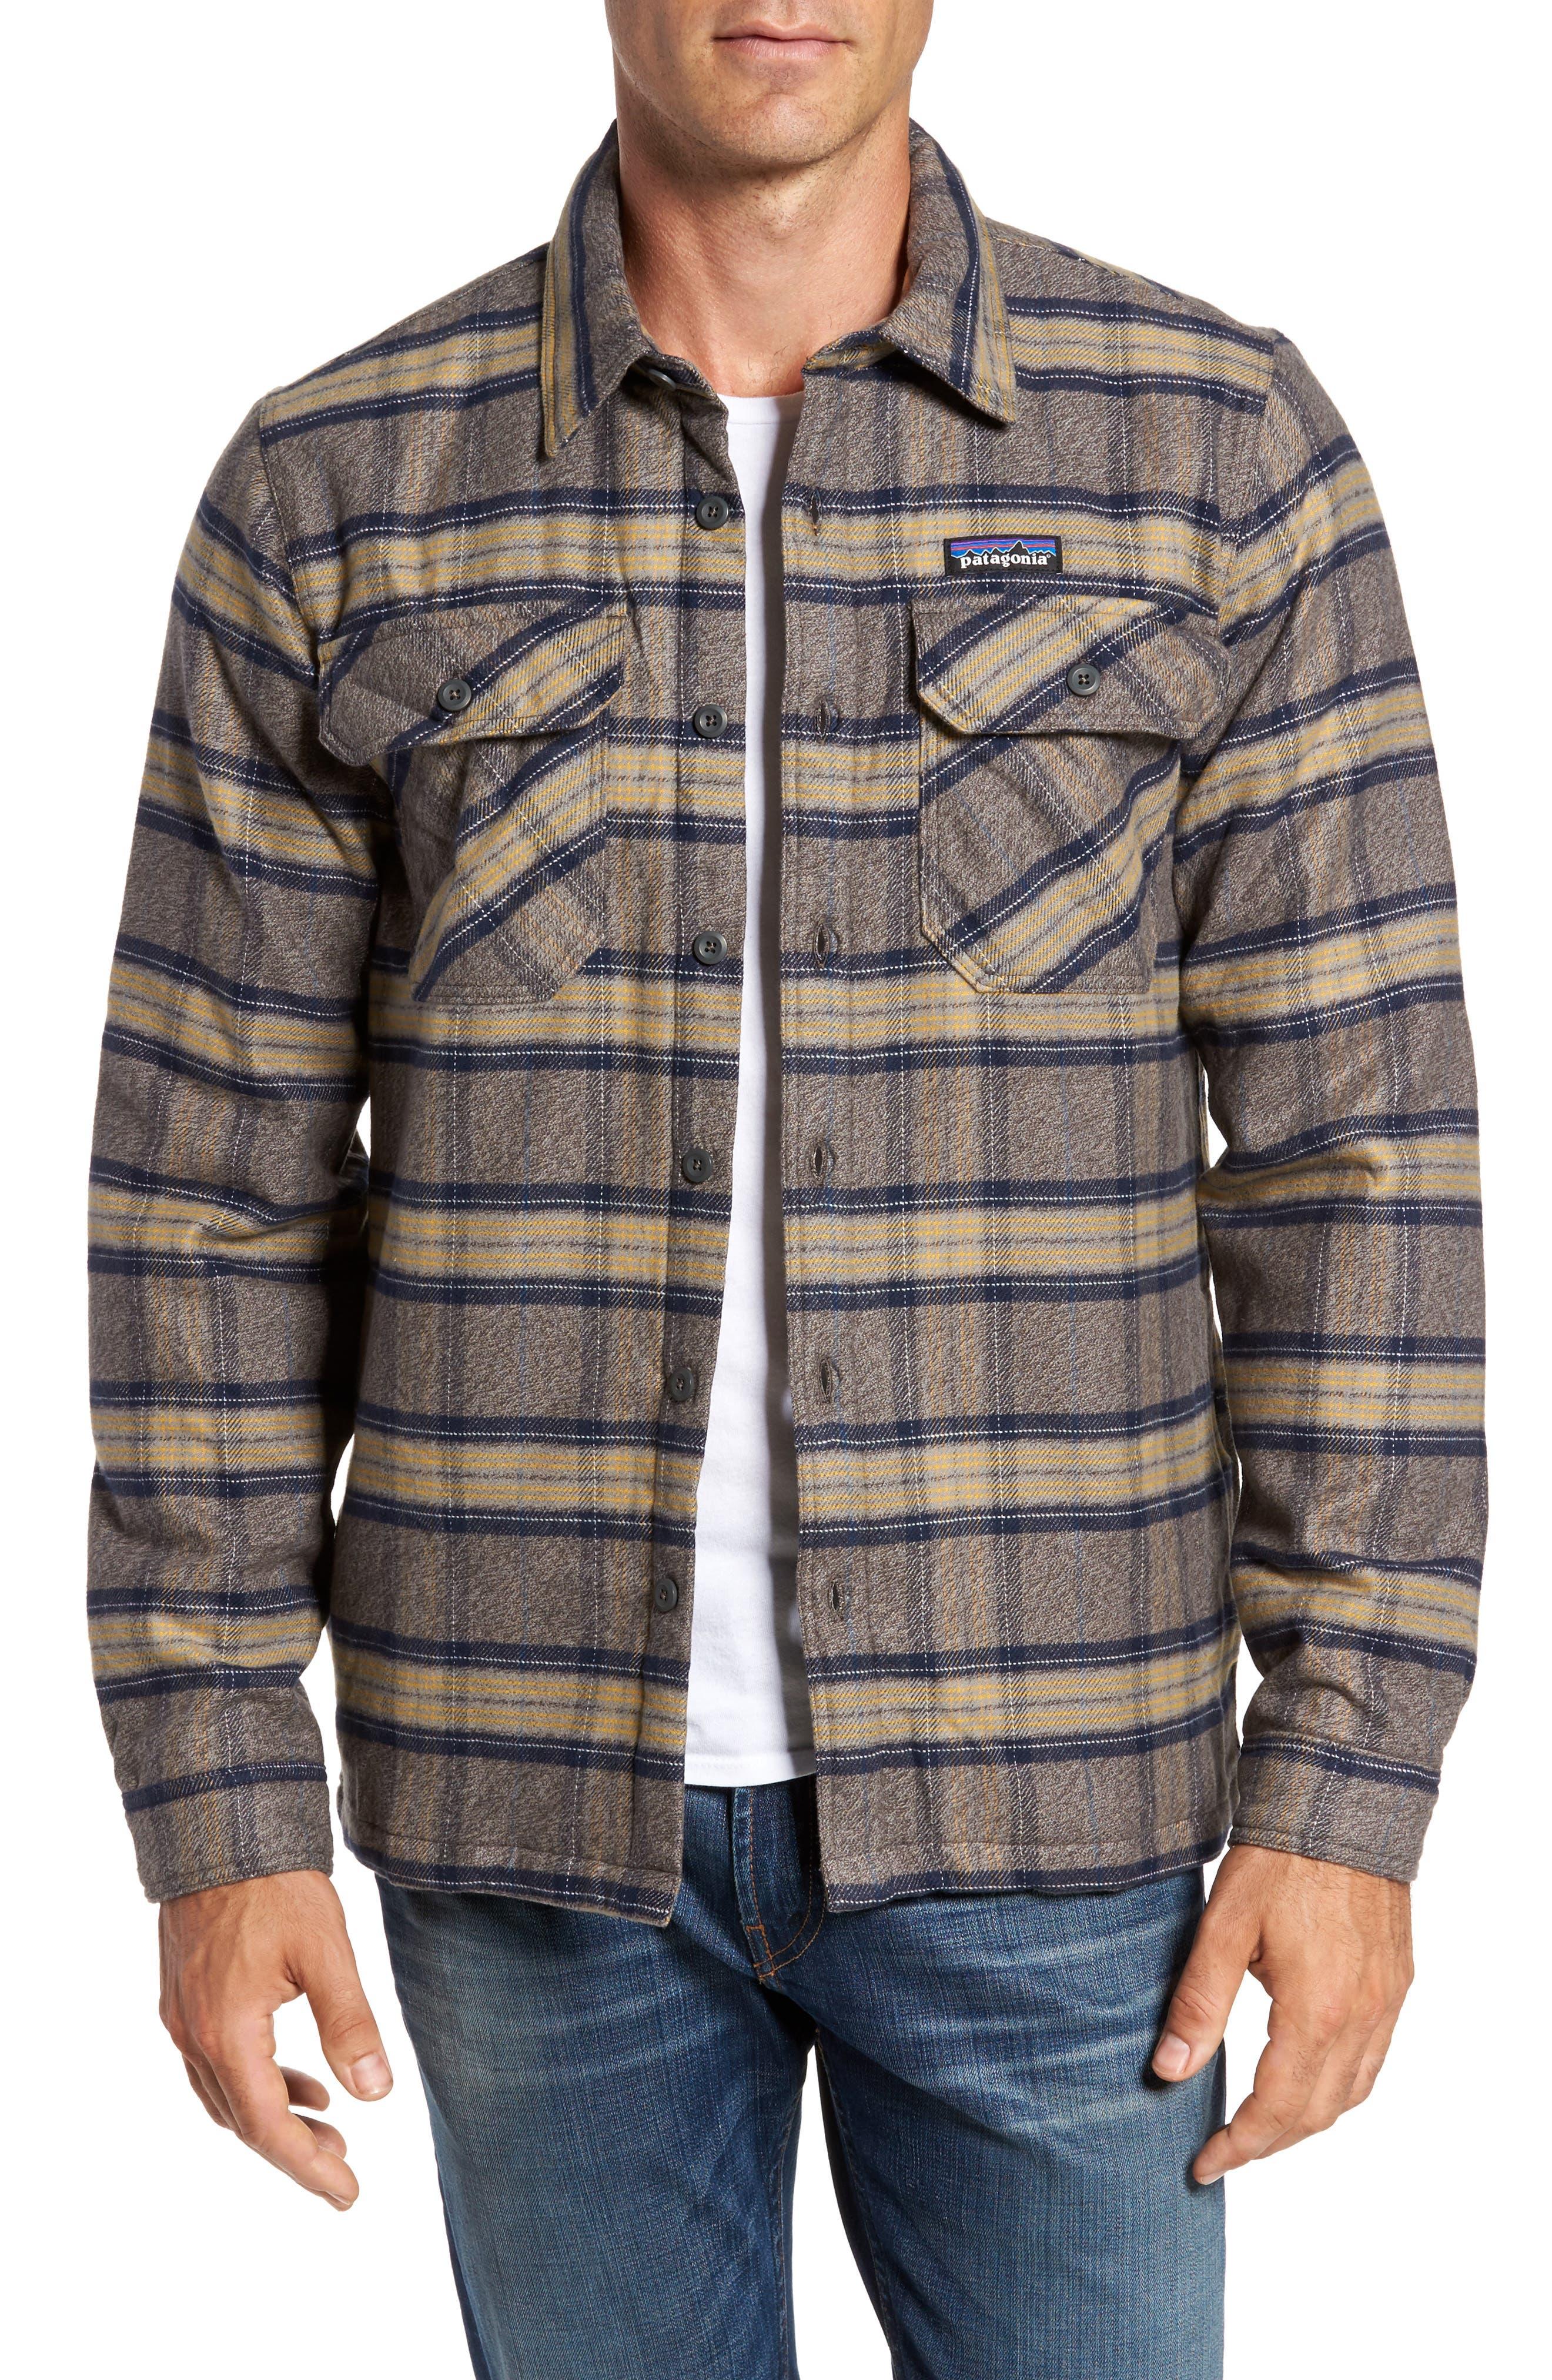 Main Image - Patagonia 'Fjord' Flannel Shirt Jacket